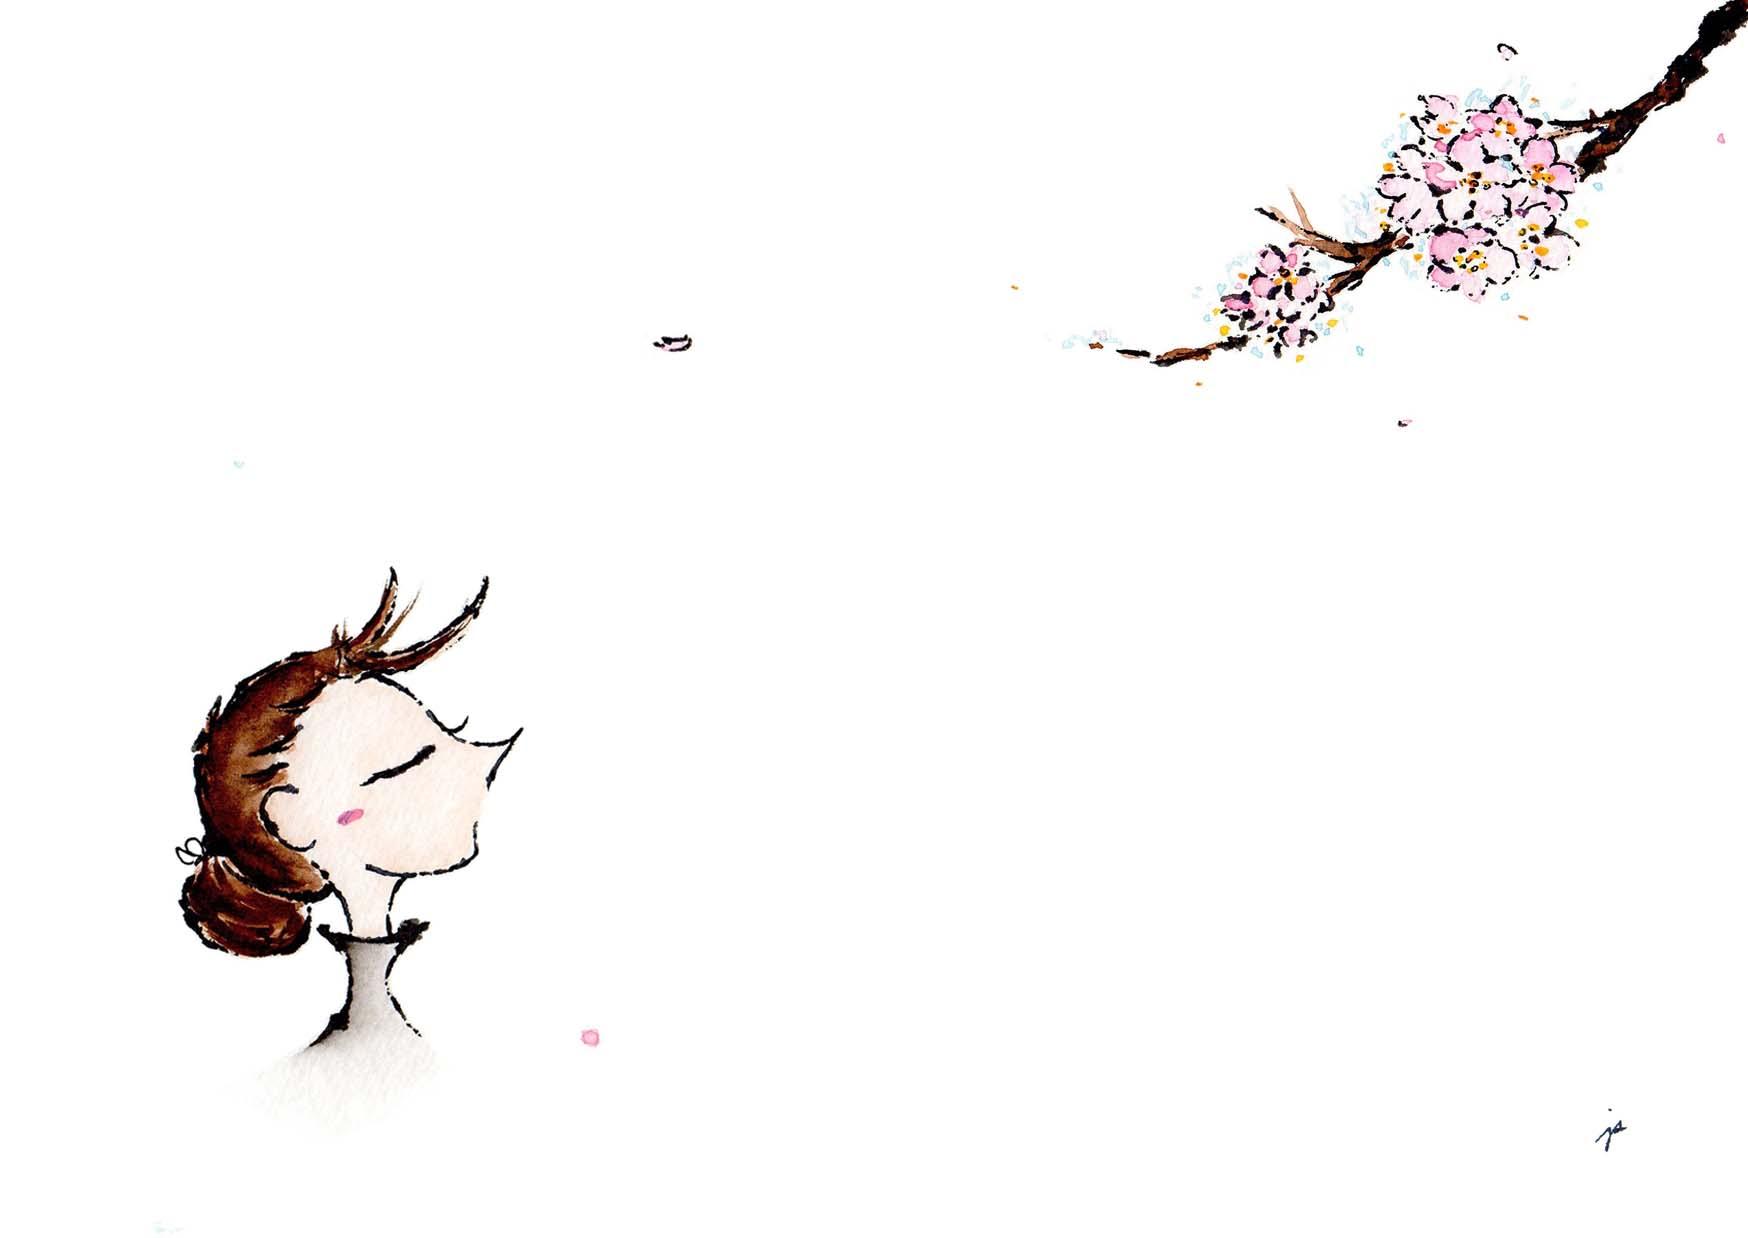 lala--sakura_jodisam.jpg